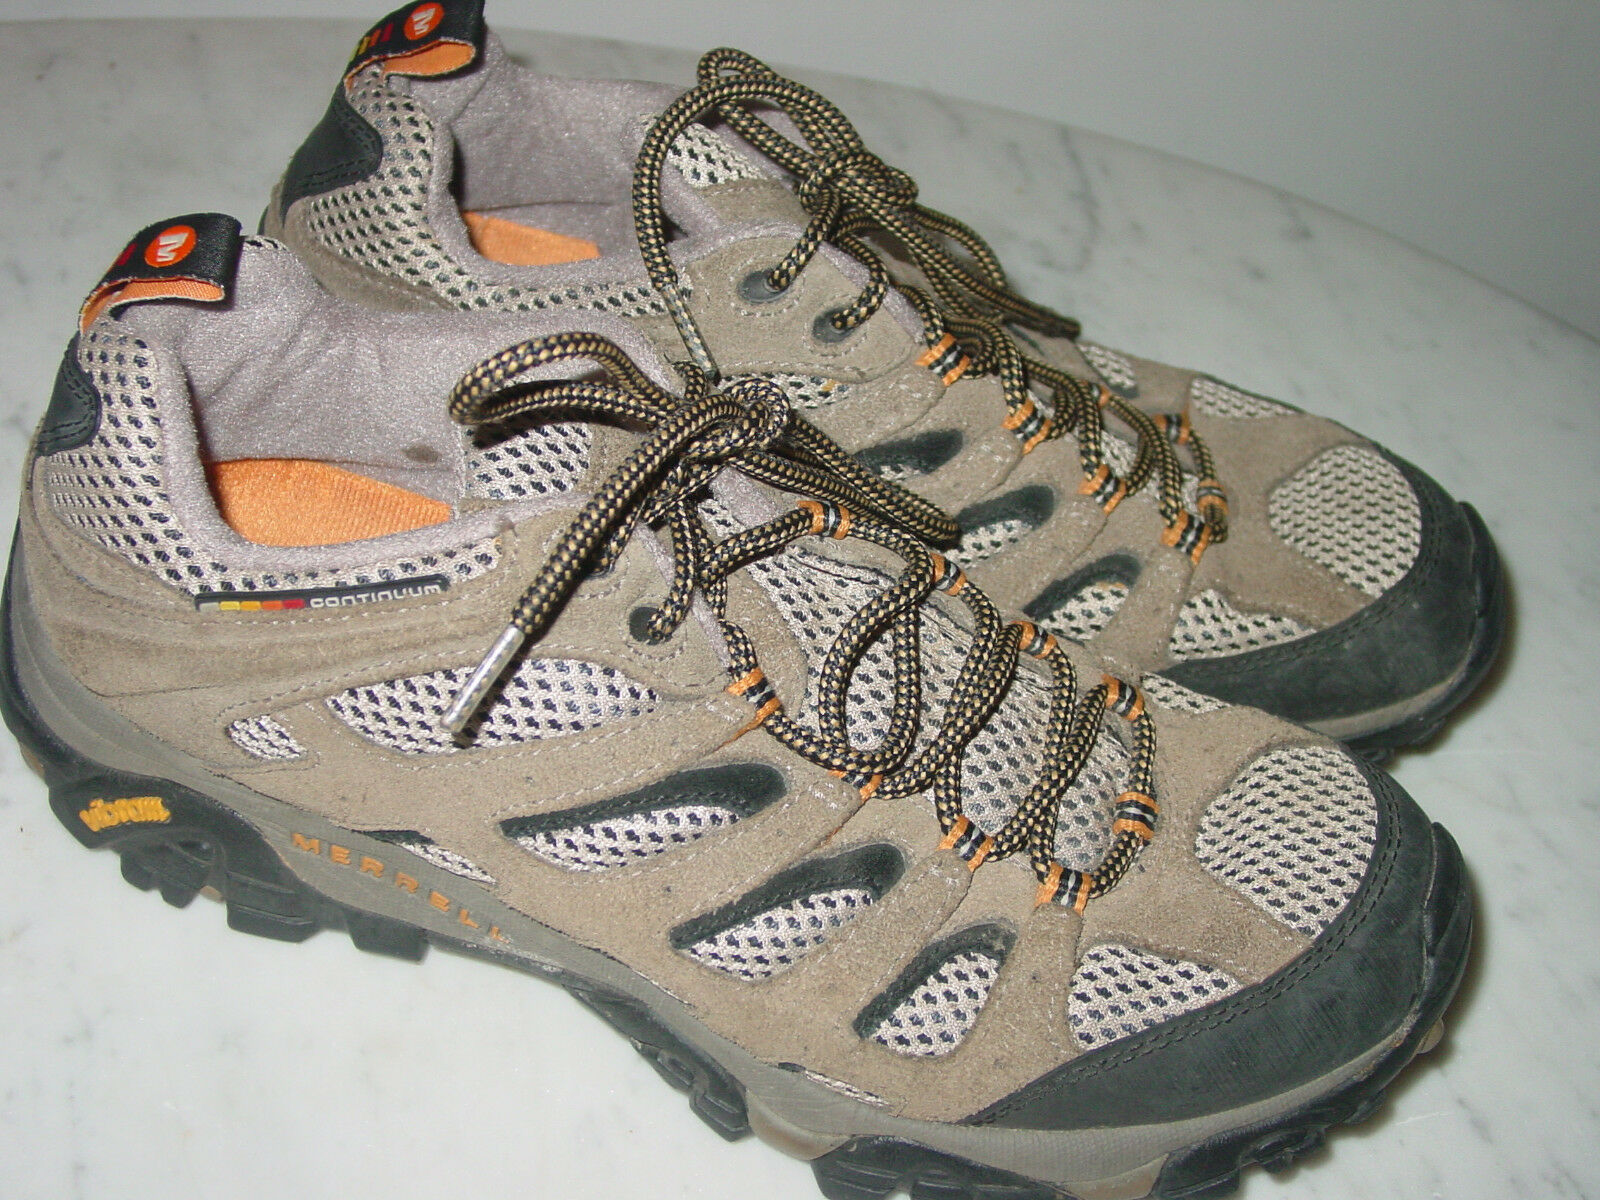 Merrell Moab Ventilador Nogal J86595 Trail Hiking tamaño del zapato 10